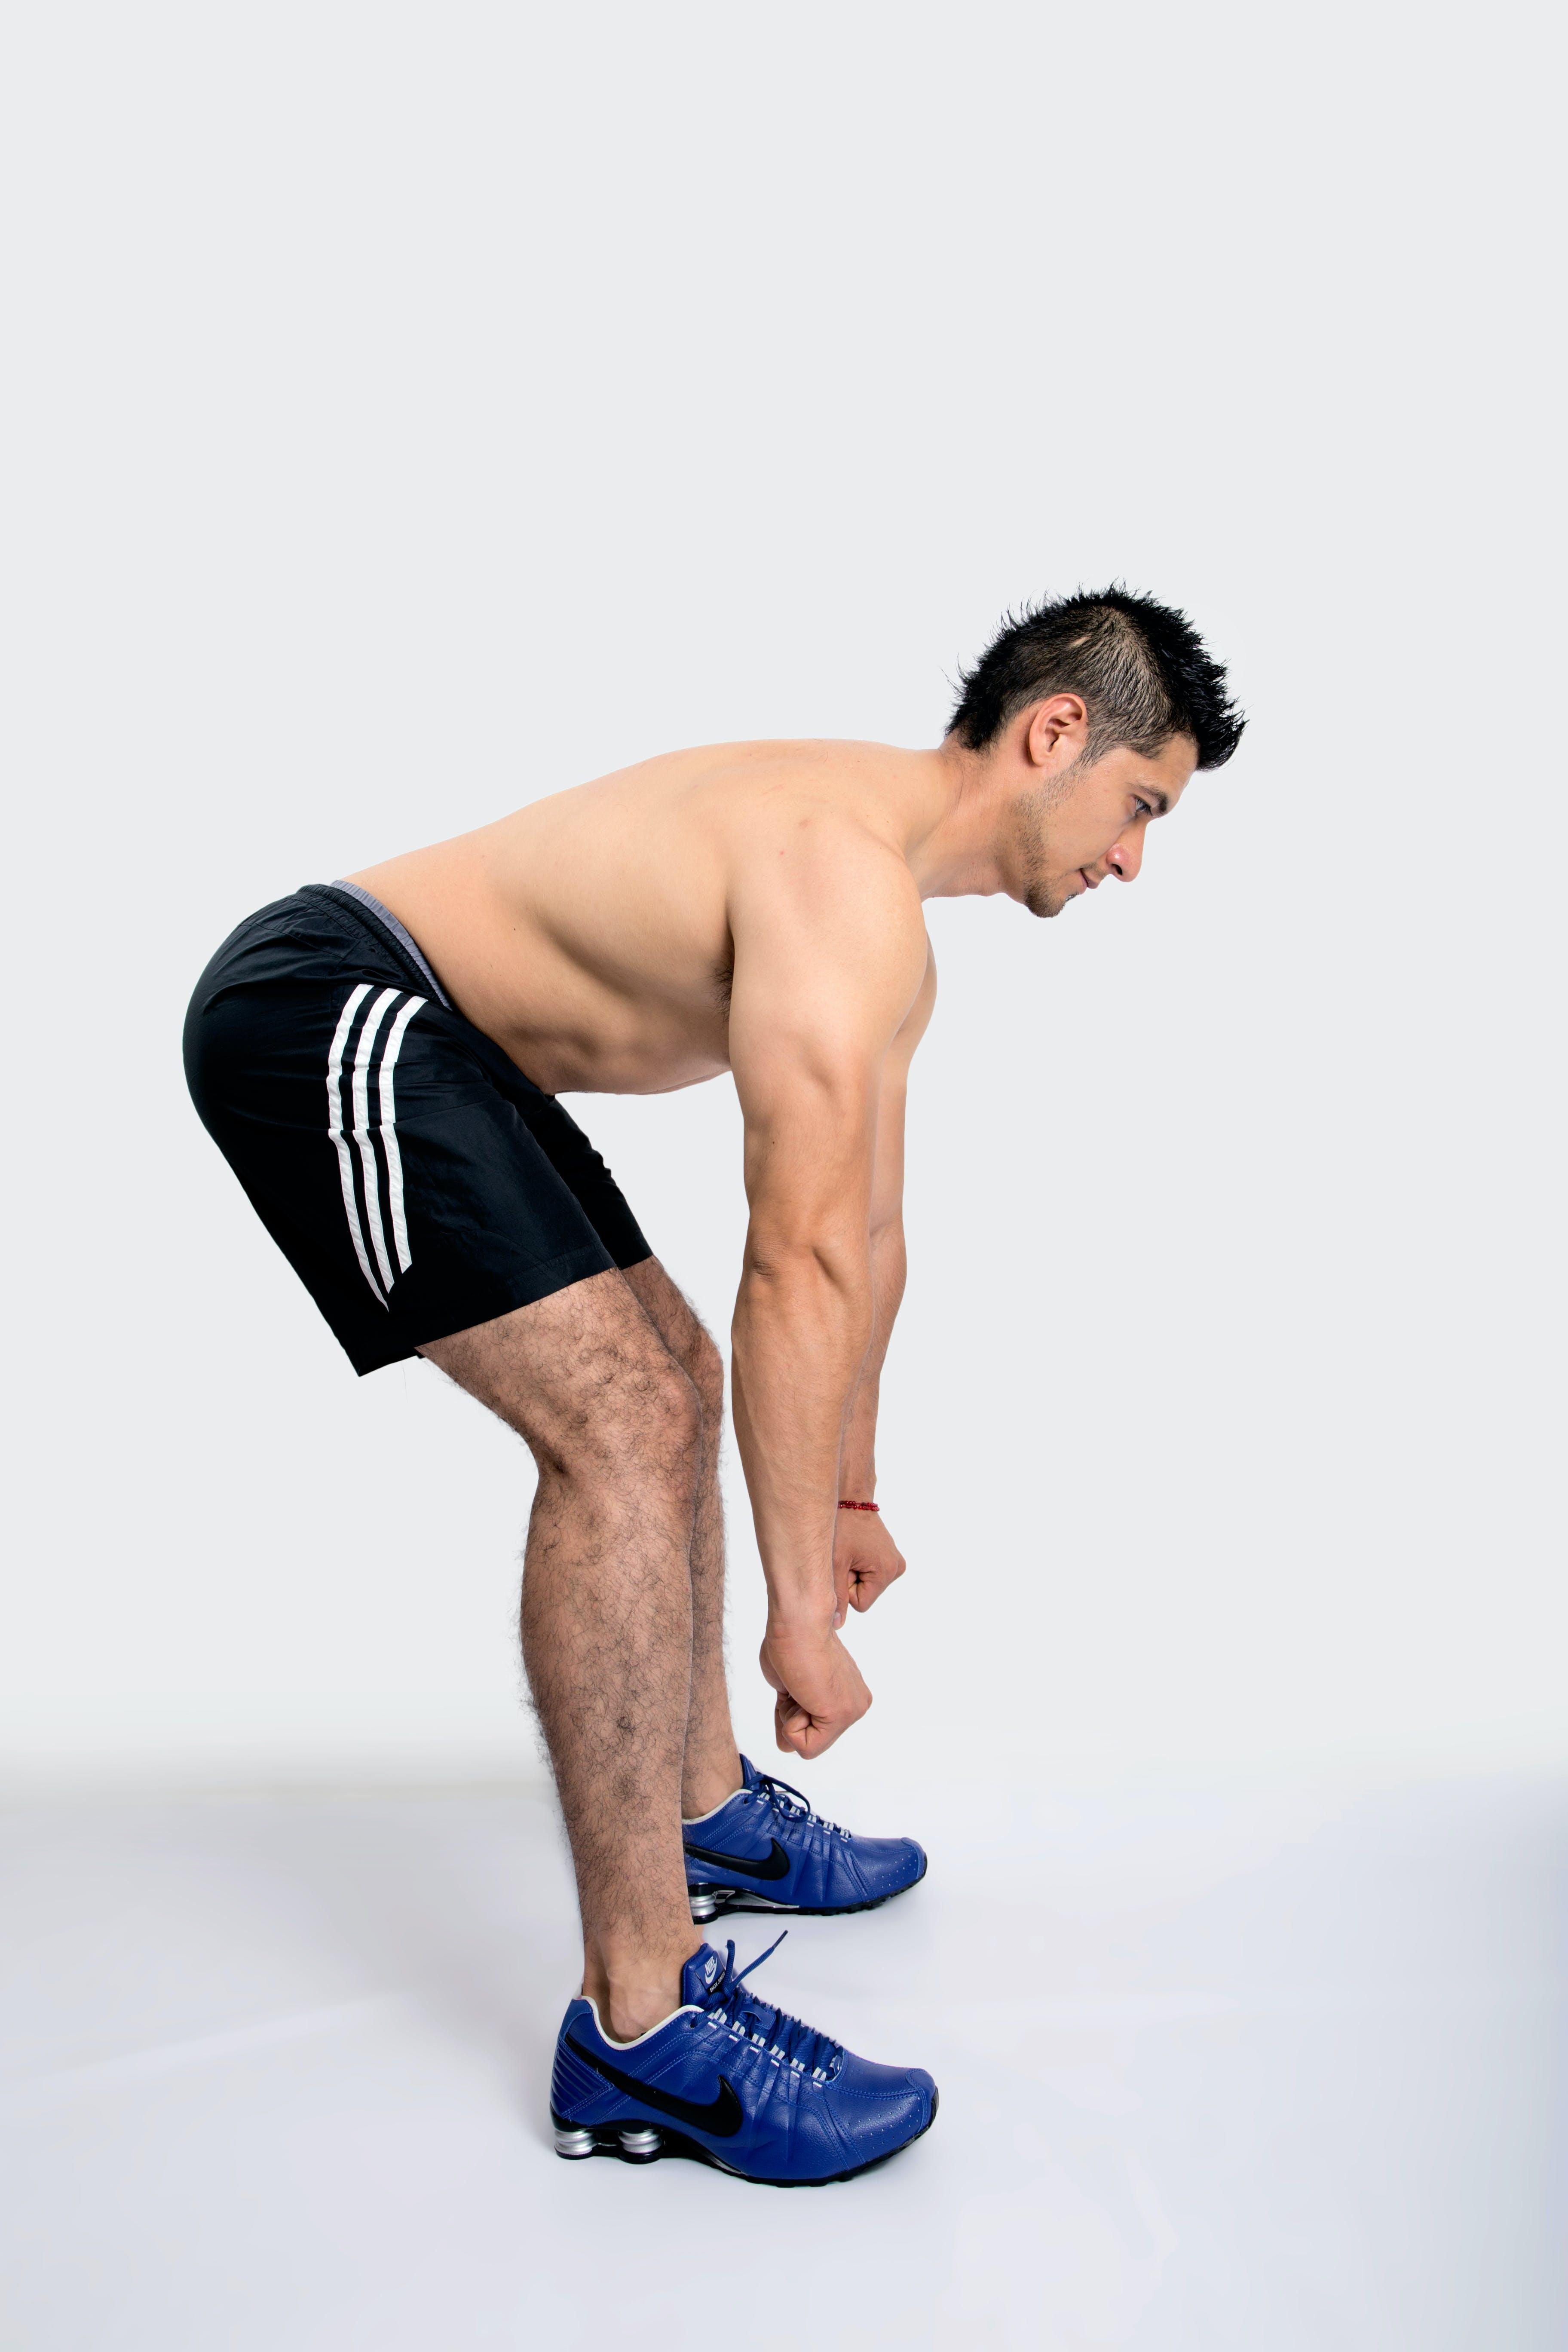 Kostenloses Stock Foto zu fitness, hintern, latino, mann